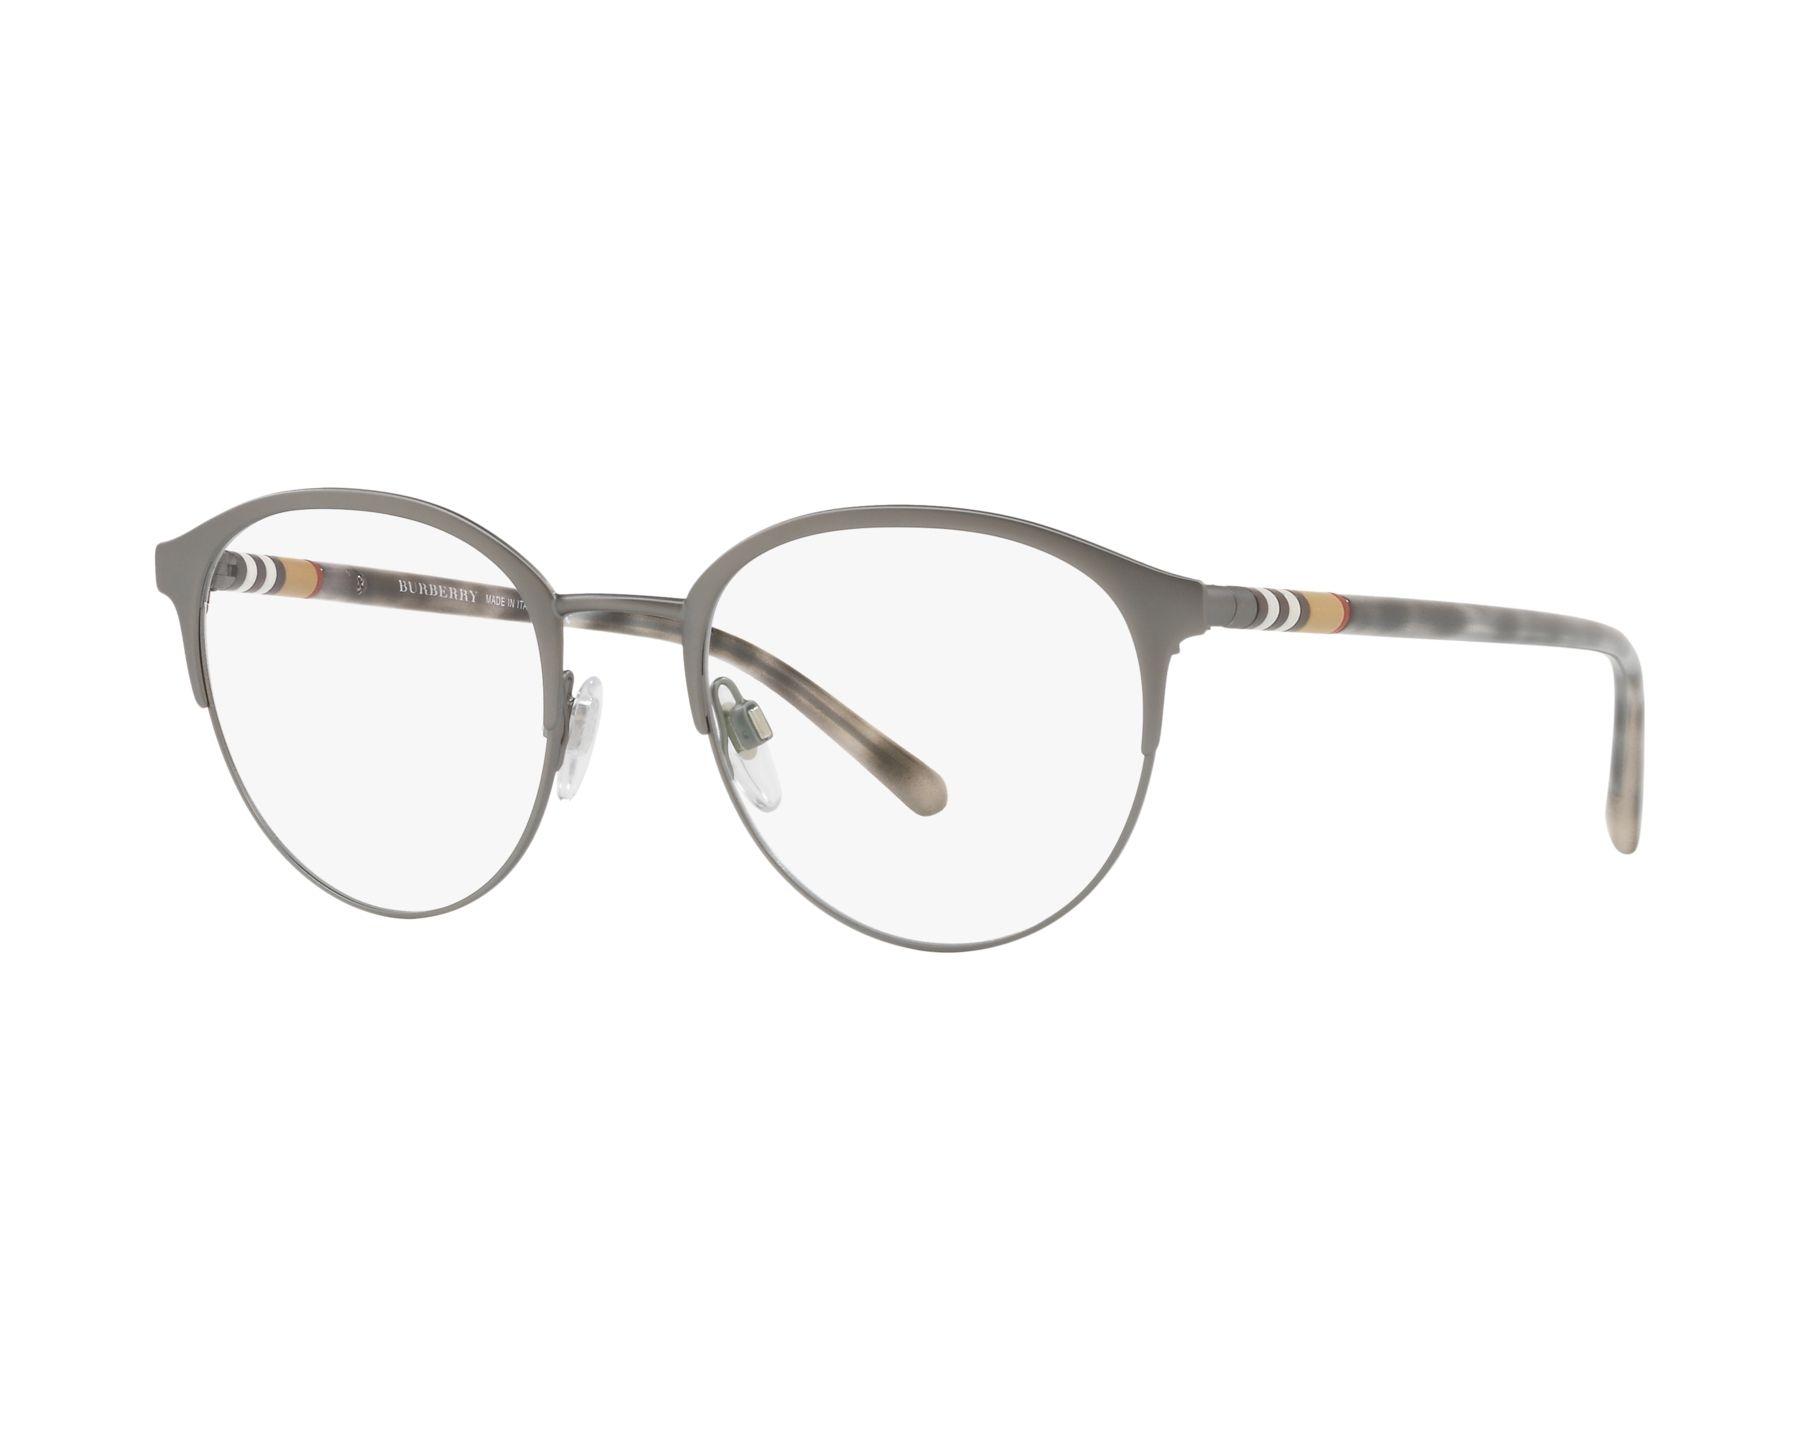 eyeglasses Burberry BE-1318 1014 51-19 Gun Grey